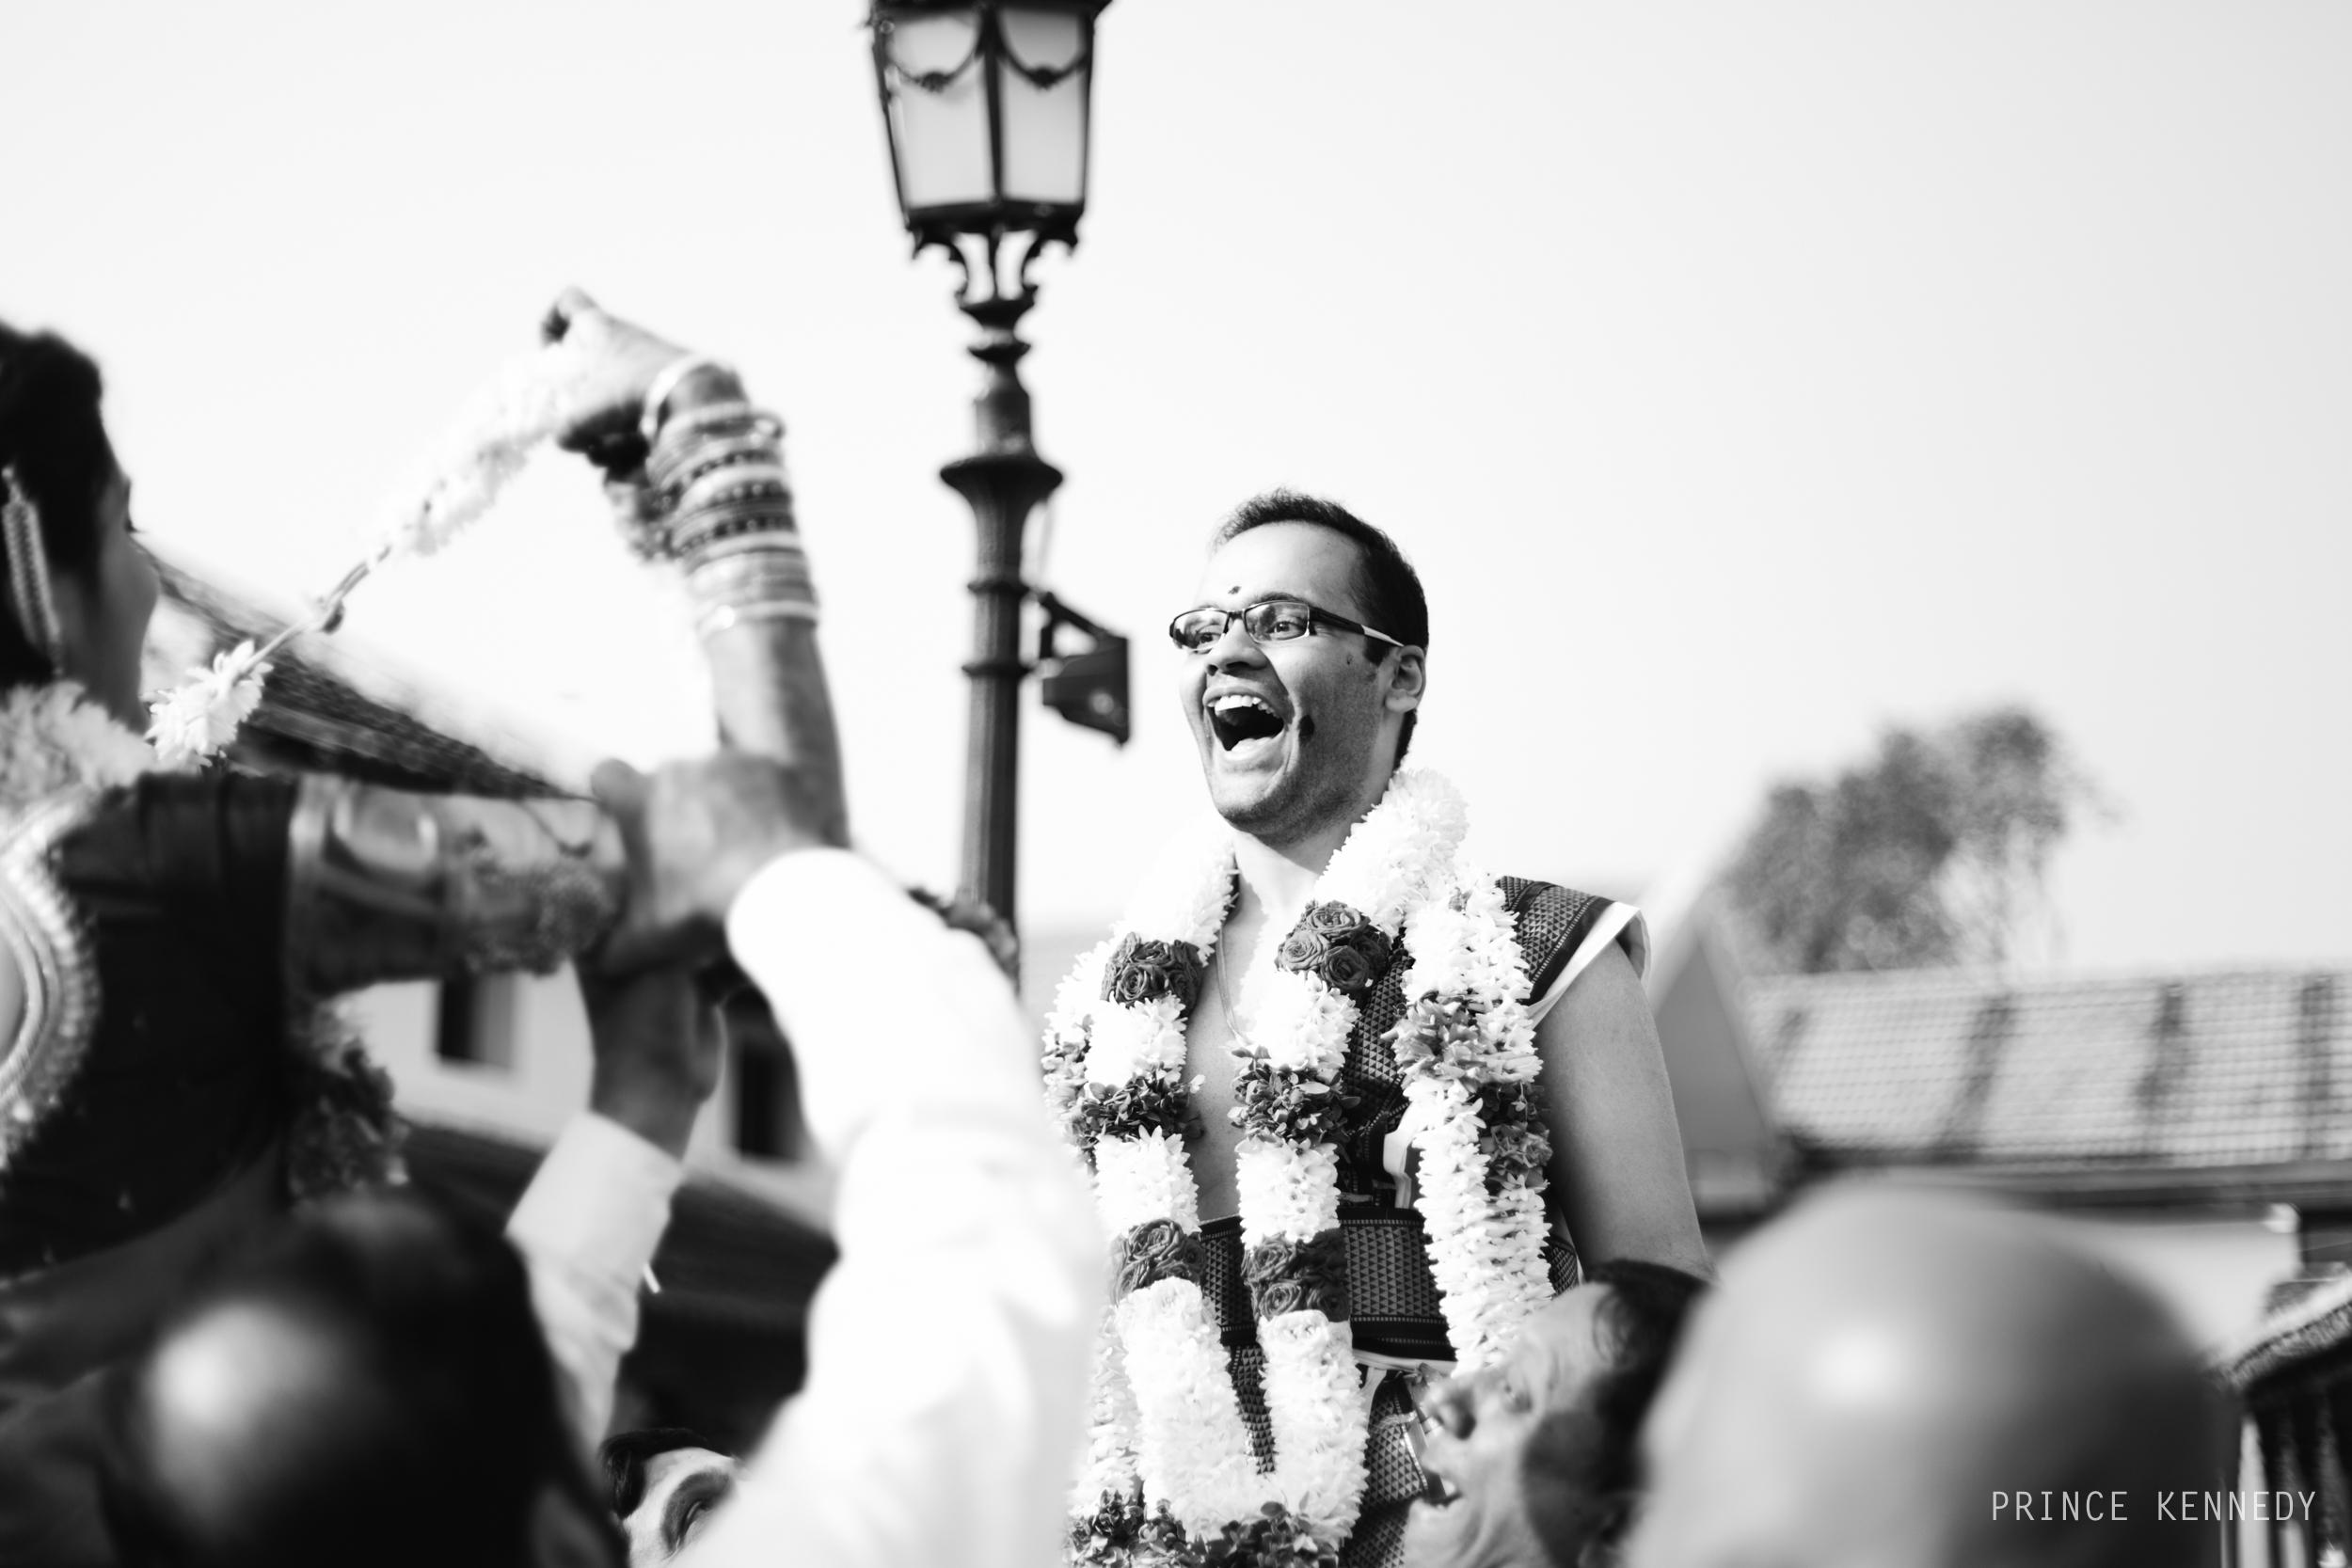 Athmajja-Nithesh-Engagement-Couple-Portrait-Portraiture-Wedding-Couple-Portrait-Chennai-Photographer-Candid-Photography-Destination-Best-Prince-Kennedy-Photography-89.jpg